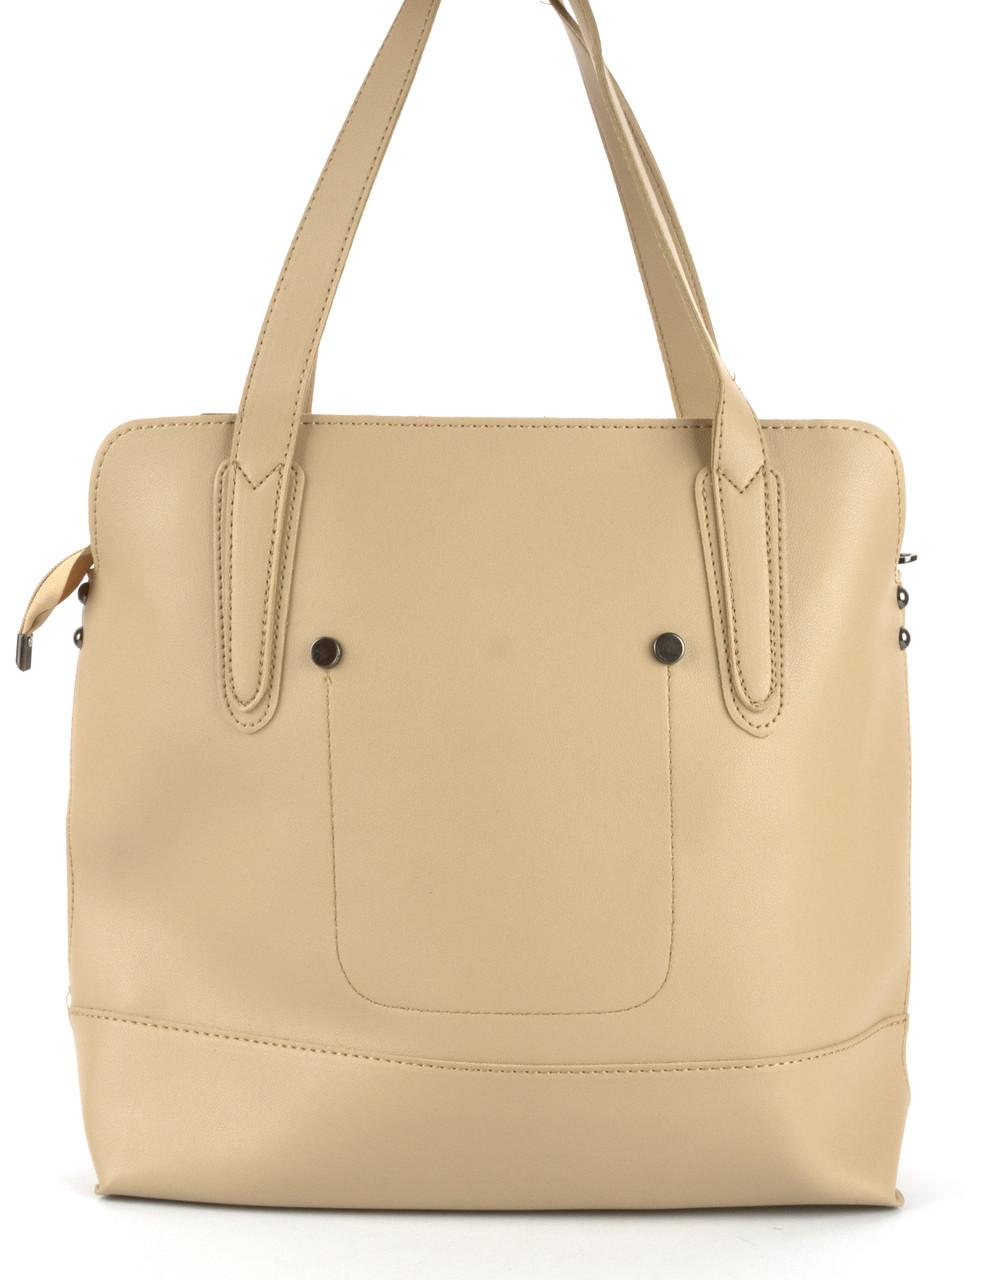 Женская стильная сумочка из эко кожи  Жасмин art. 8919